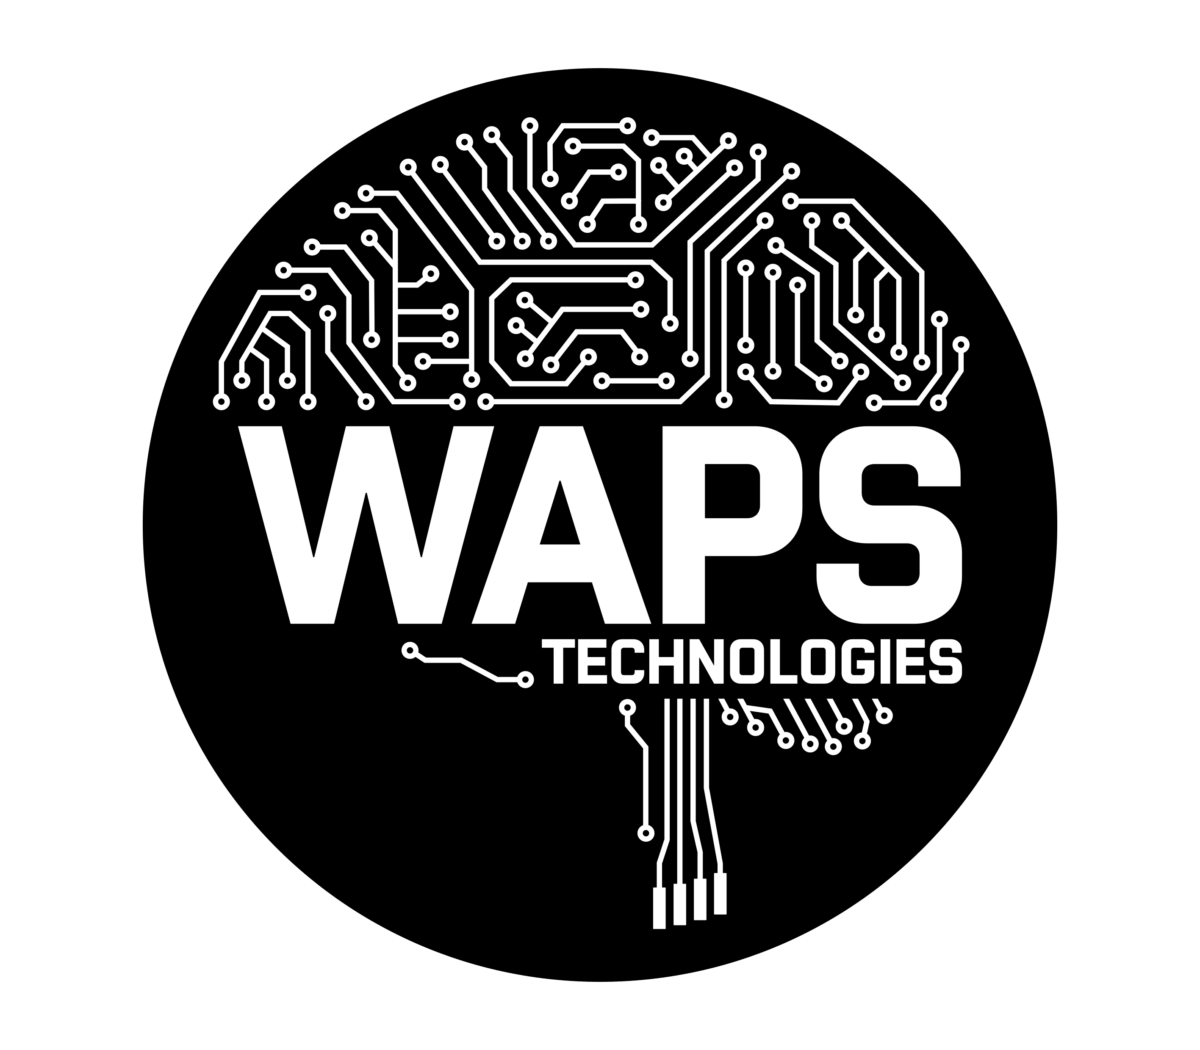 WAPS technologies_CzechDemo